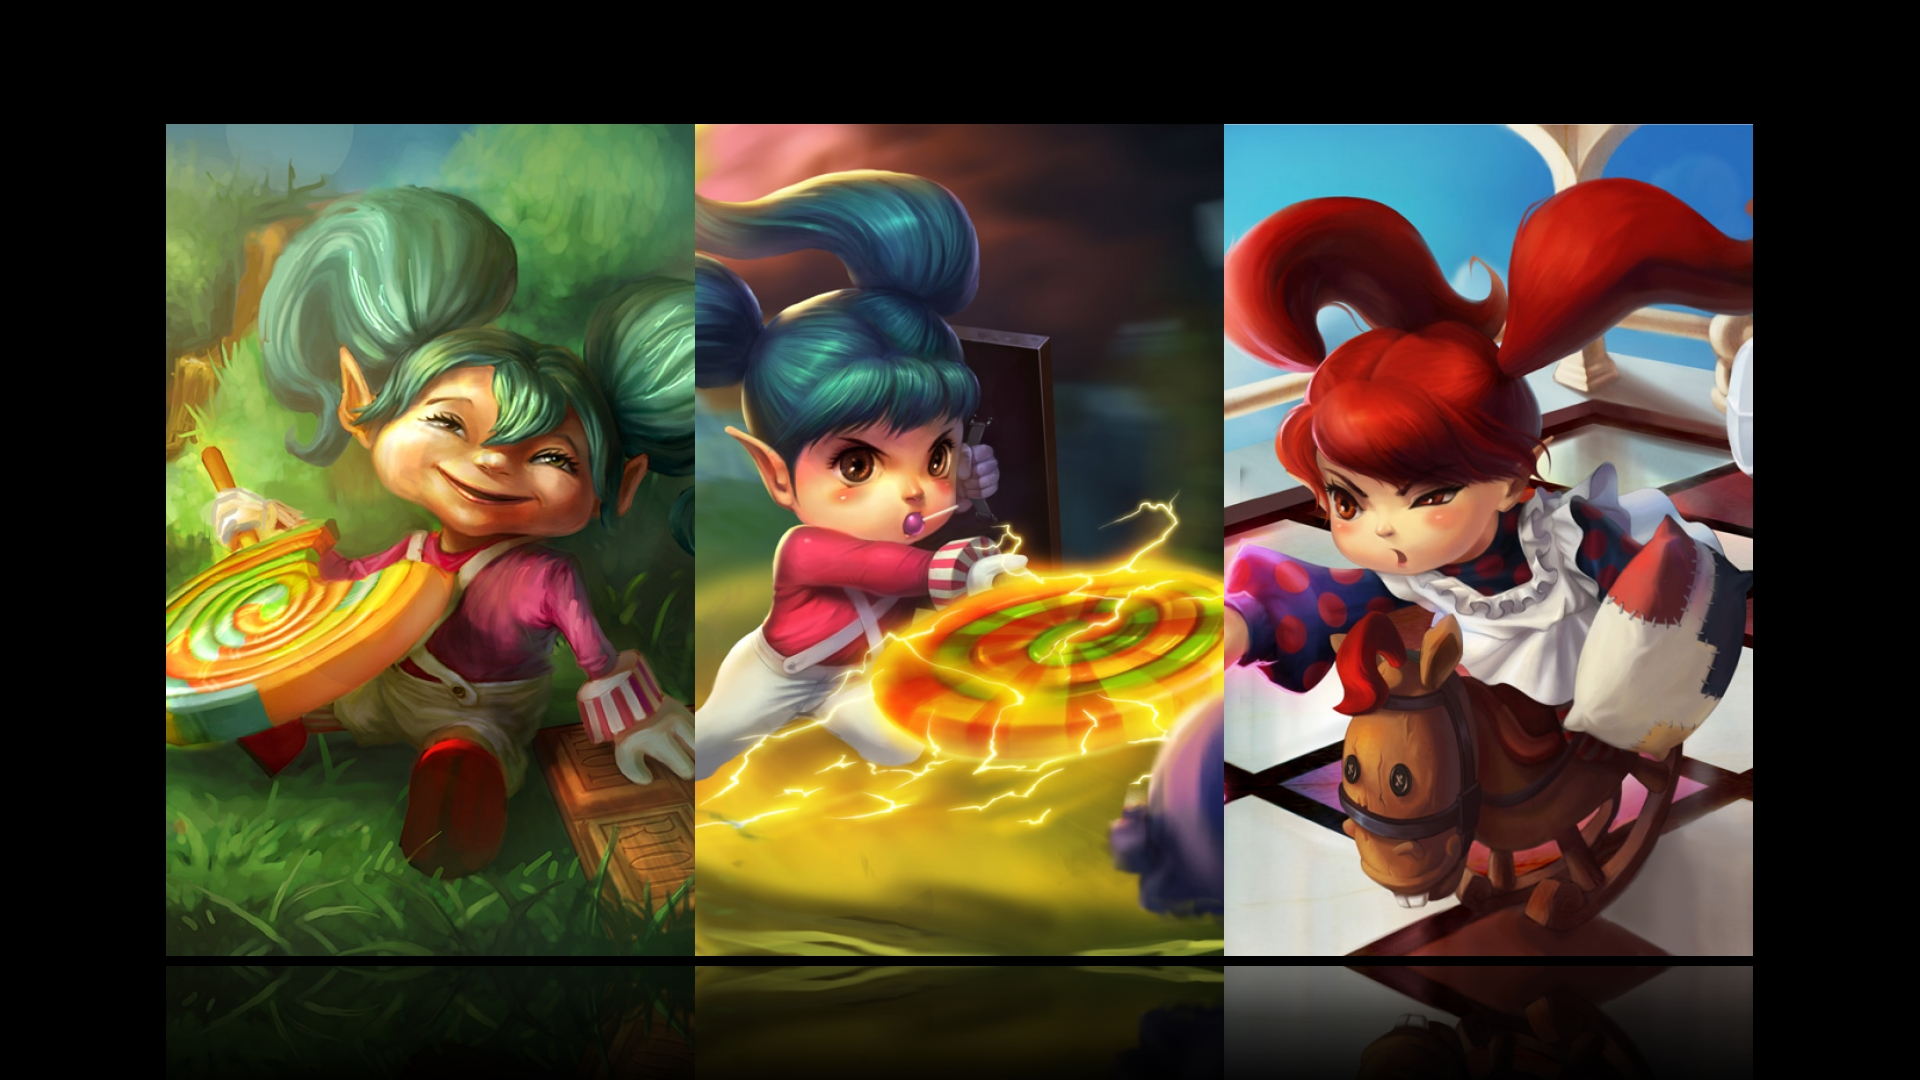 League Of Legends Poppy Wallpaper: League Of Legends Poppy Wallpaper